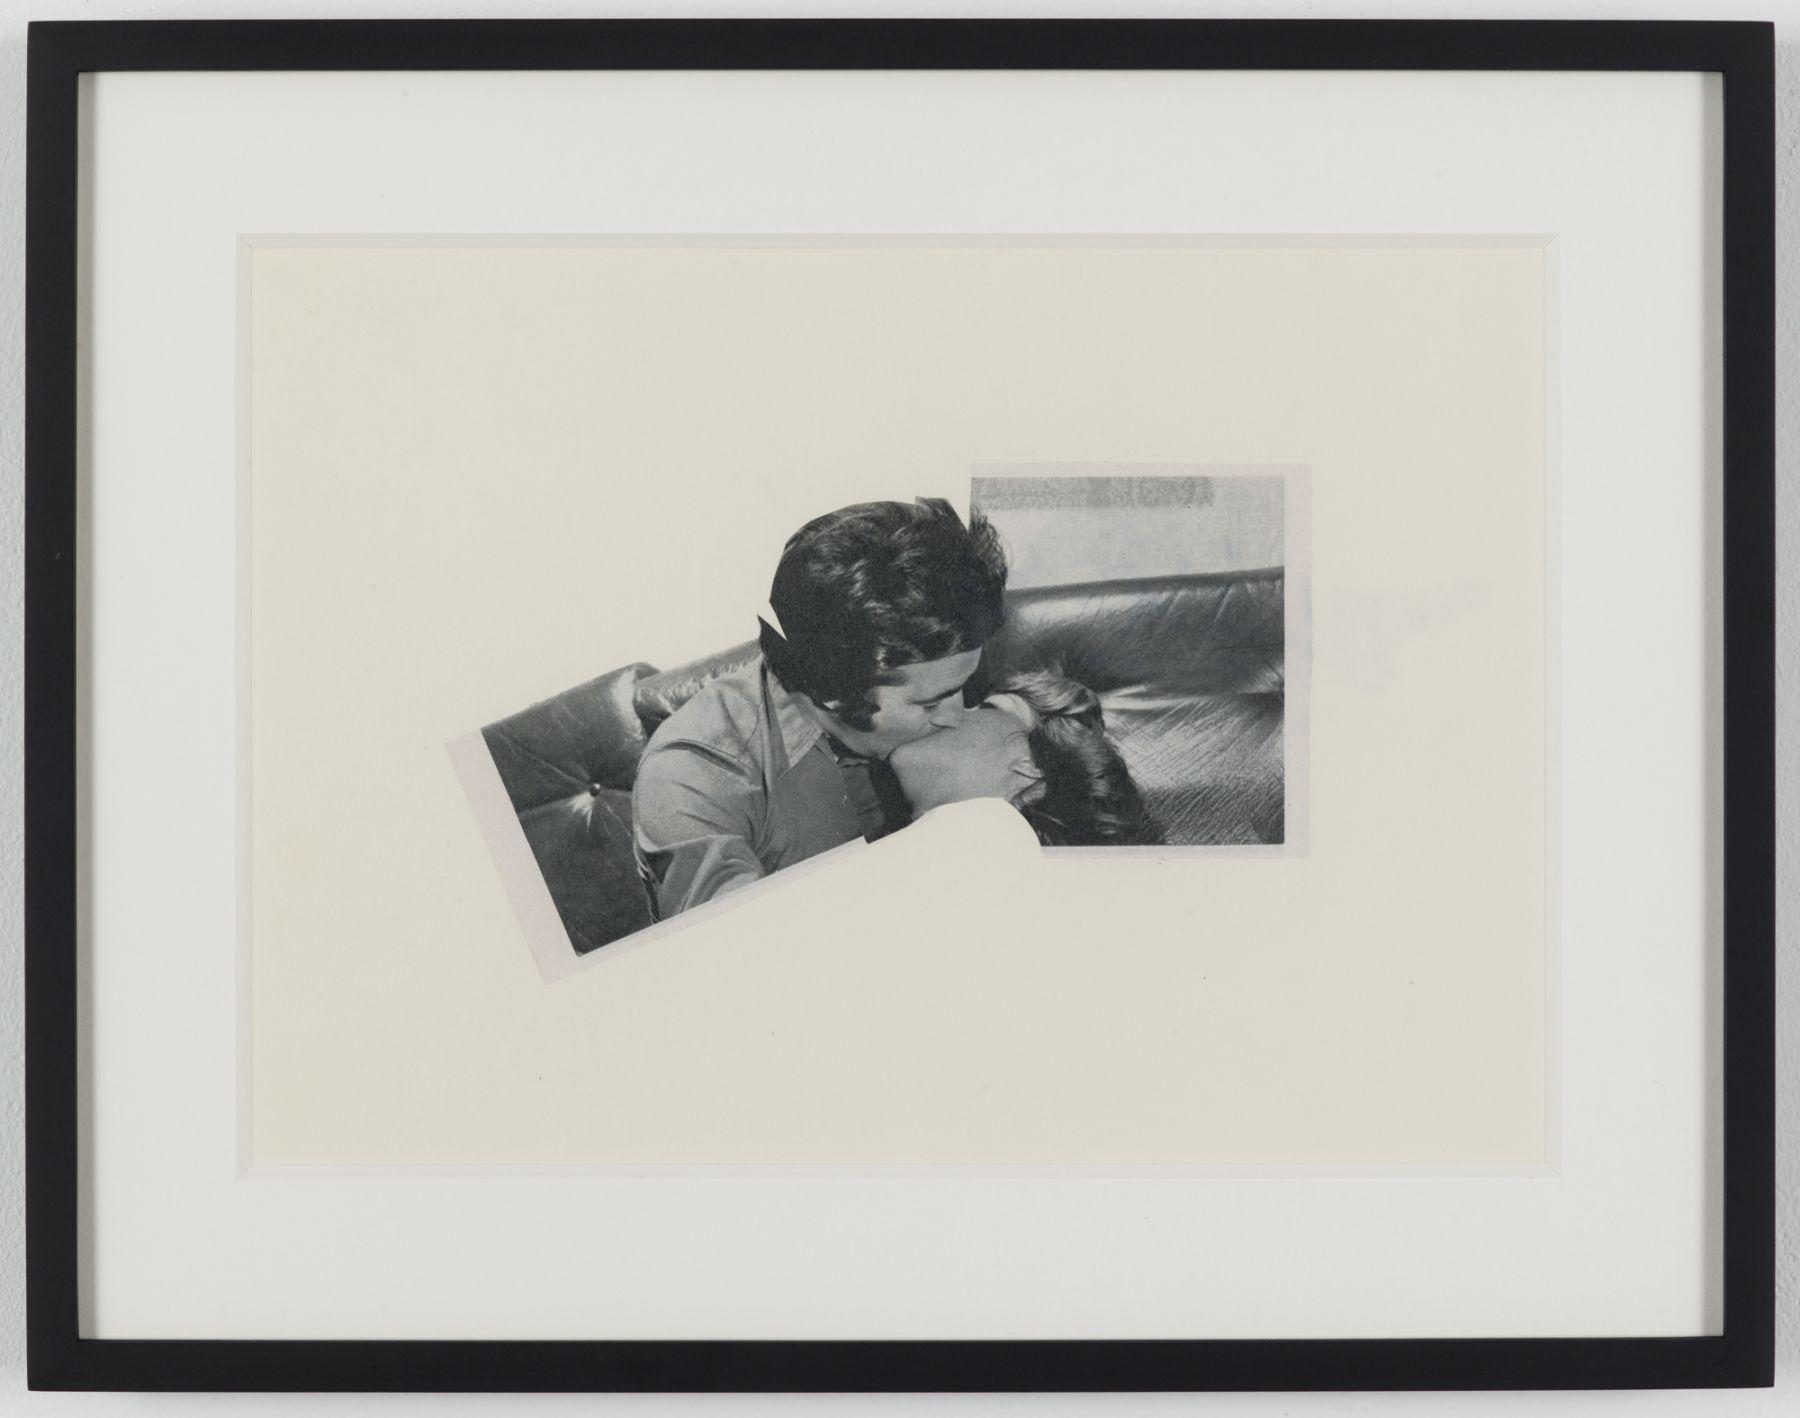 John Stezaker, Kiss II (Photoroman)